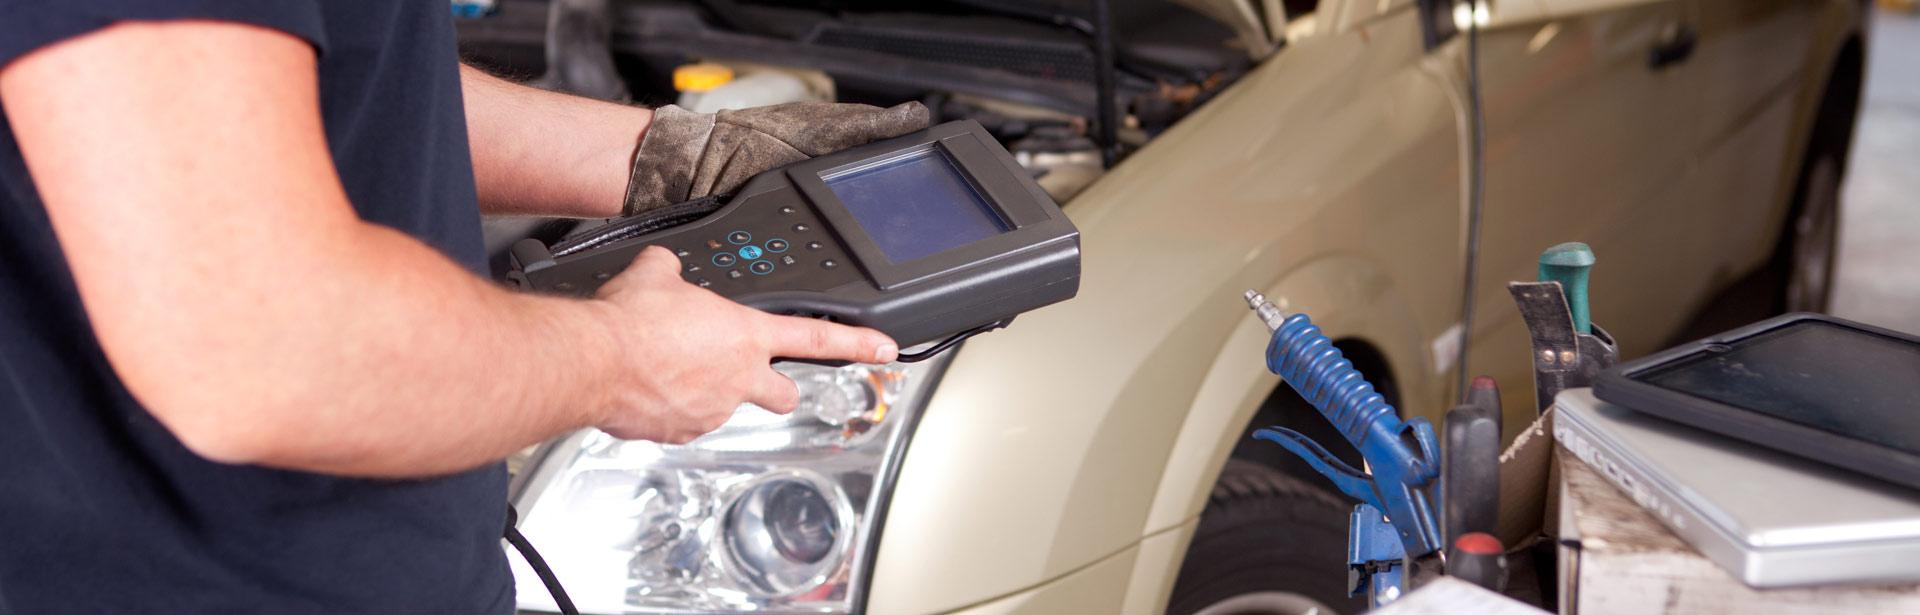 Offene Standards bei Elektronik, Diagnose und Kommunikation | GVA Gesamtverband Autoteile-Handel e.V.